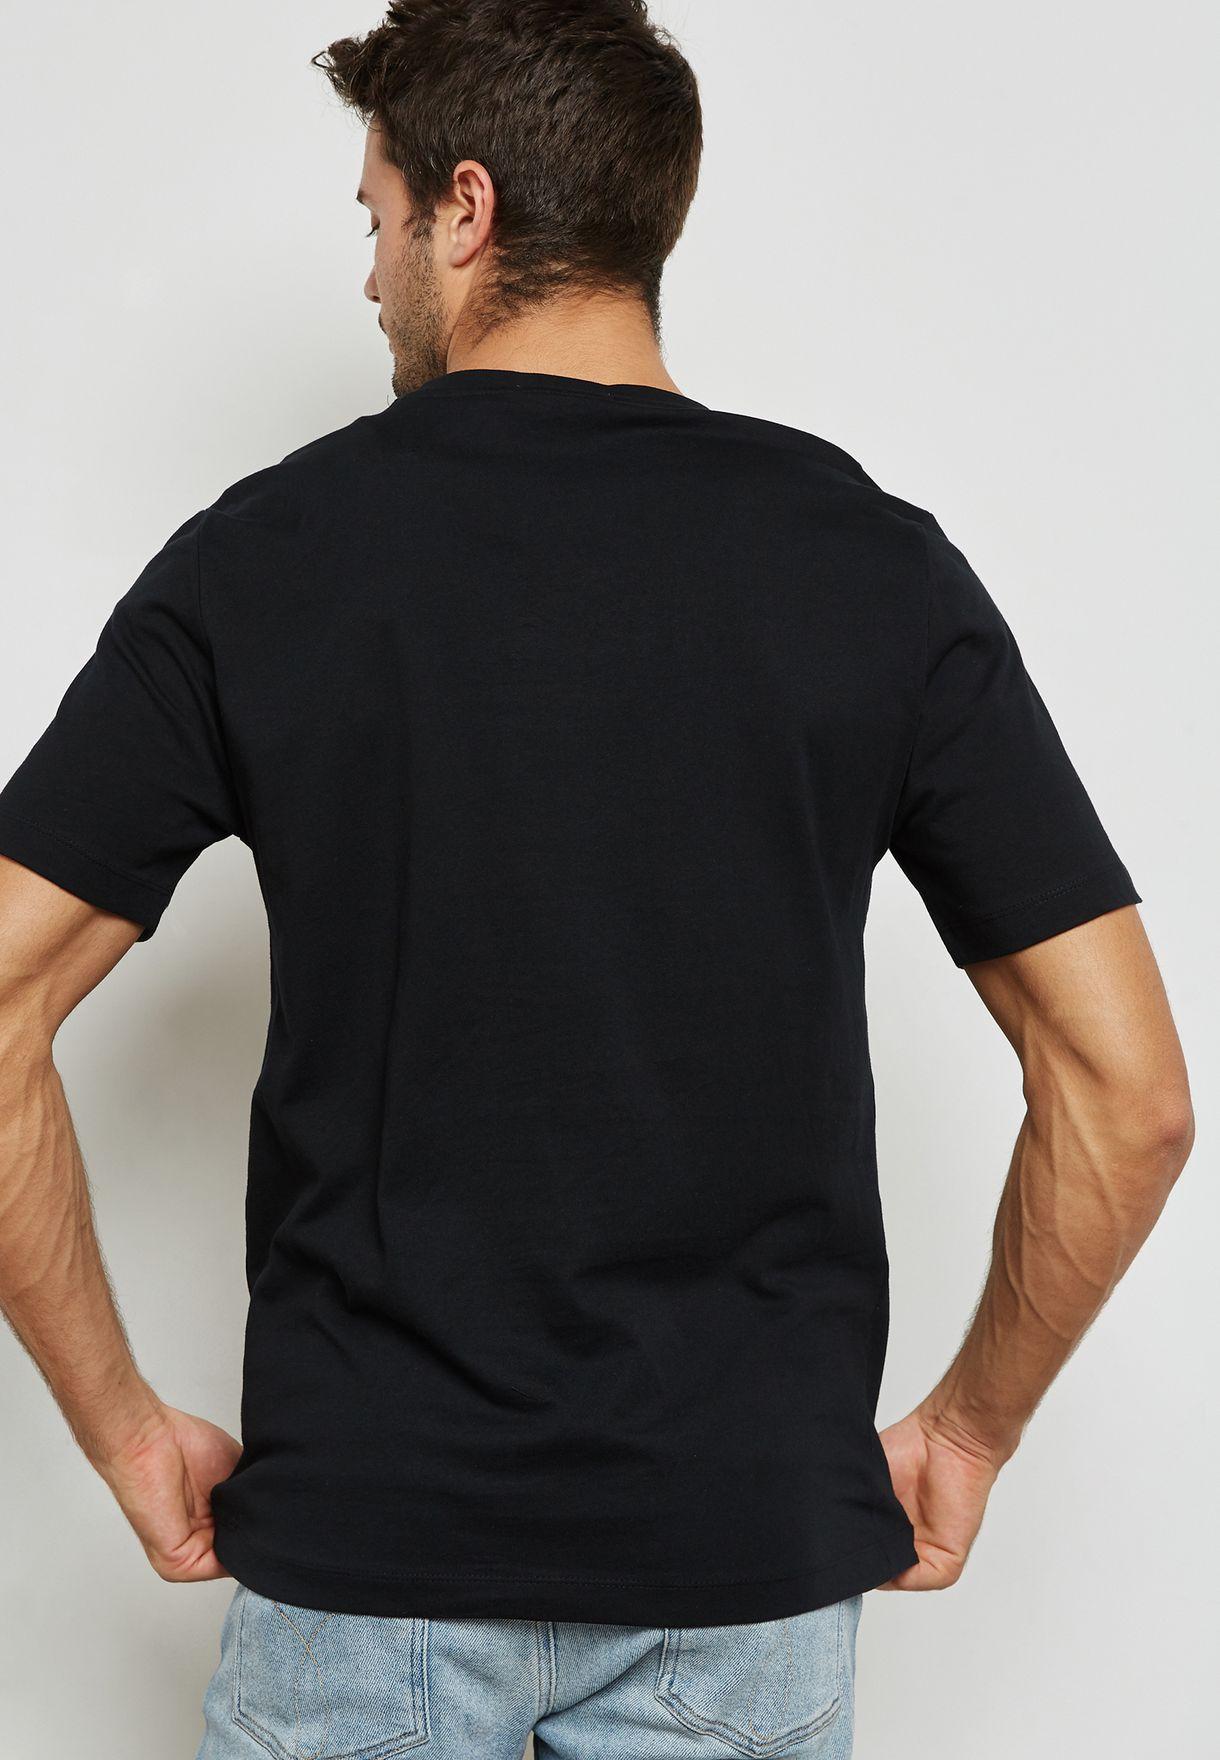 Teasia 1978 T-Shirt